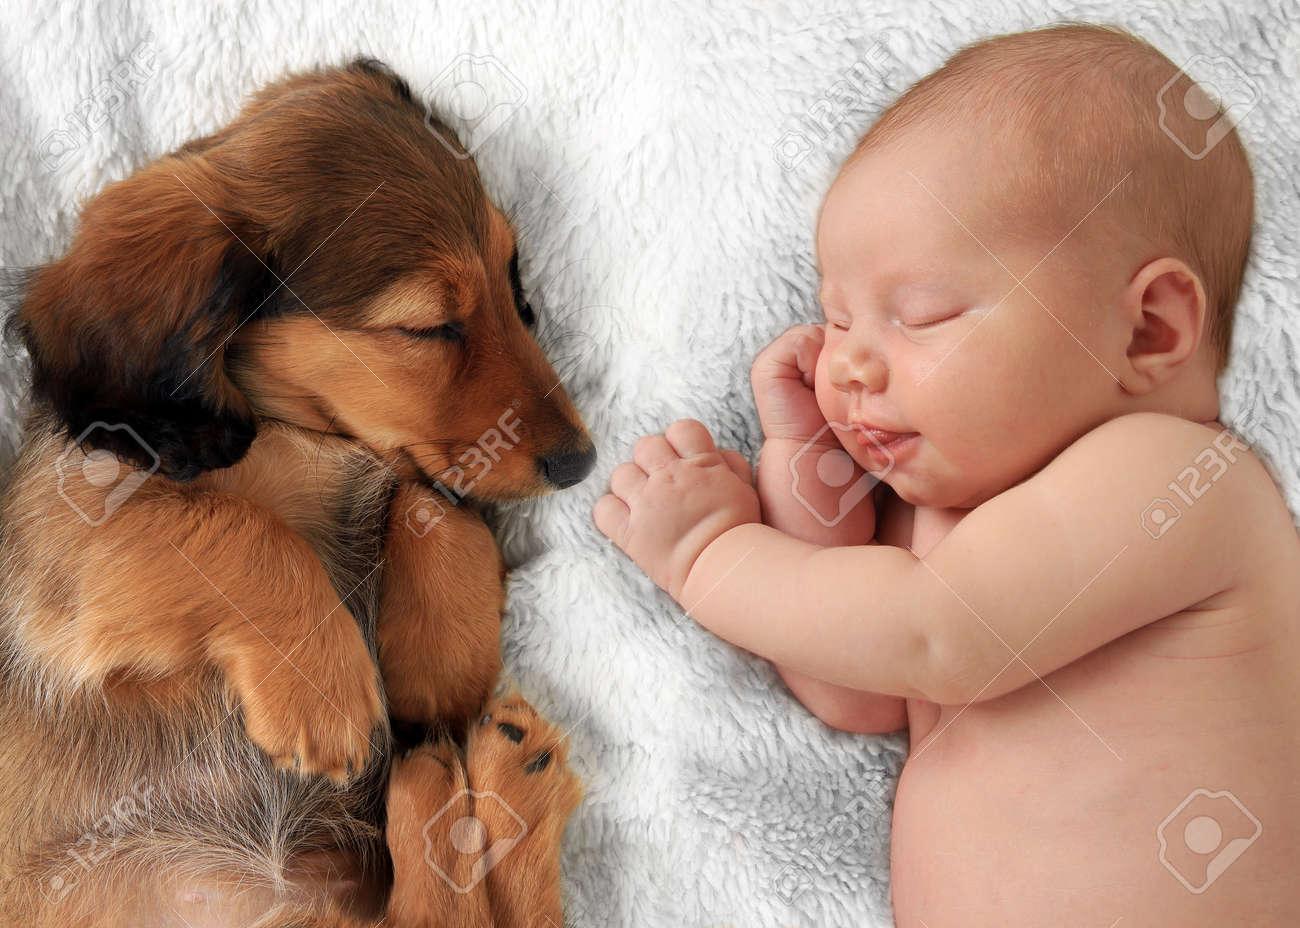 Newborn baby girl  and dachshund puppy asleep on a white blanket. Stock Photo - 43041676